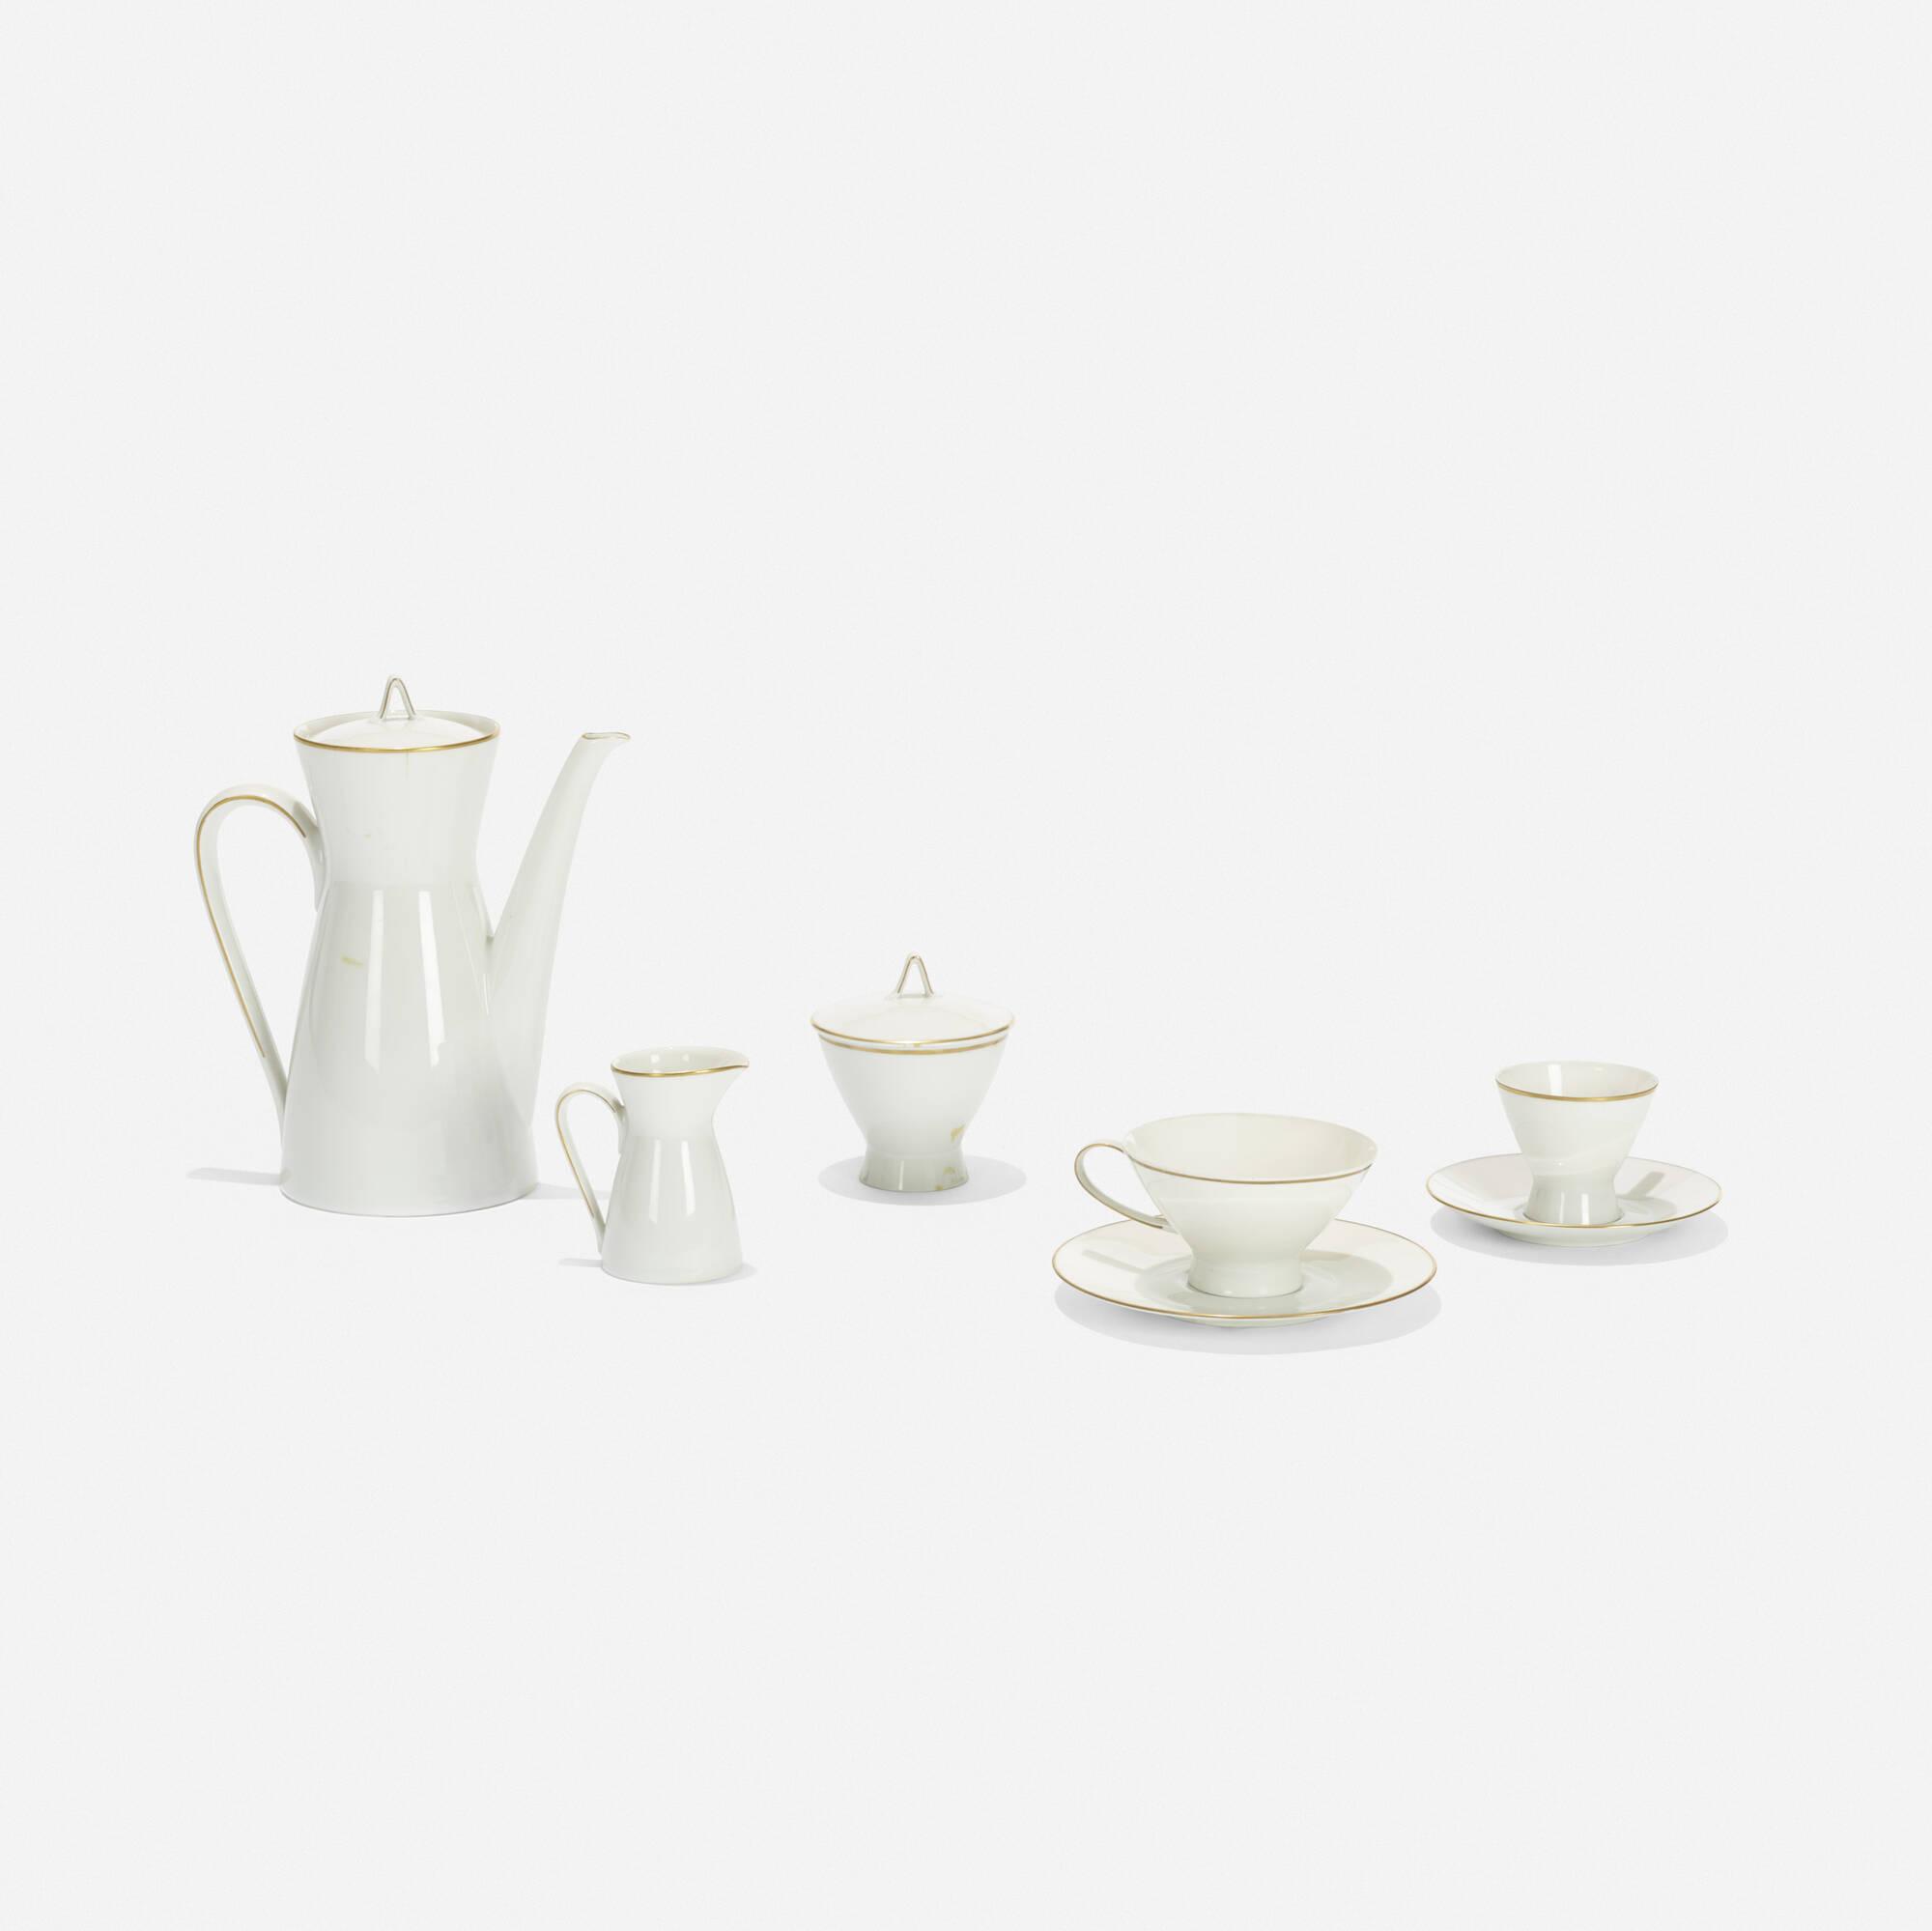 152: Raymond Loewy and Raymond Latham / coffee service (1 of 3)